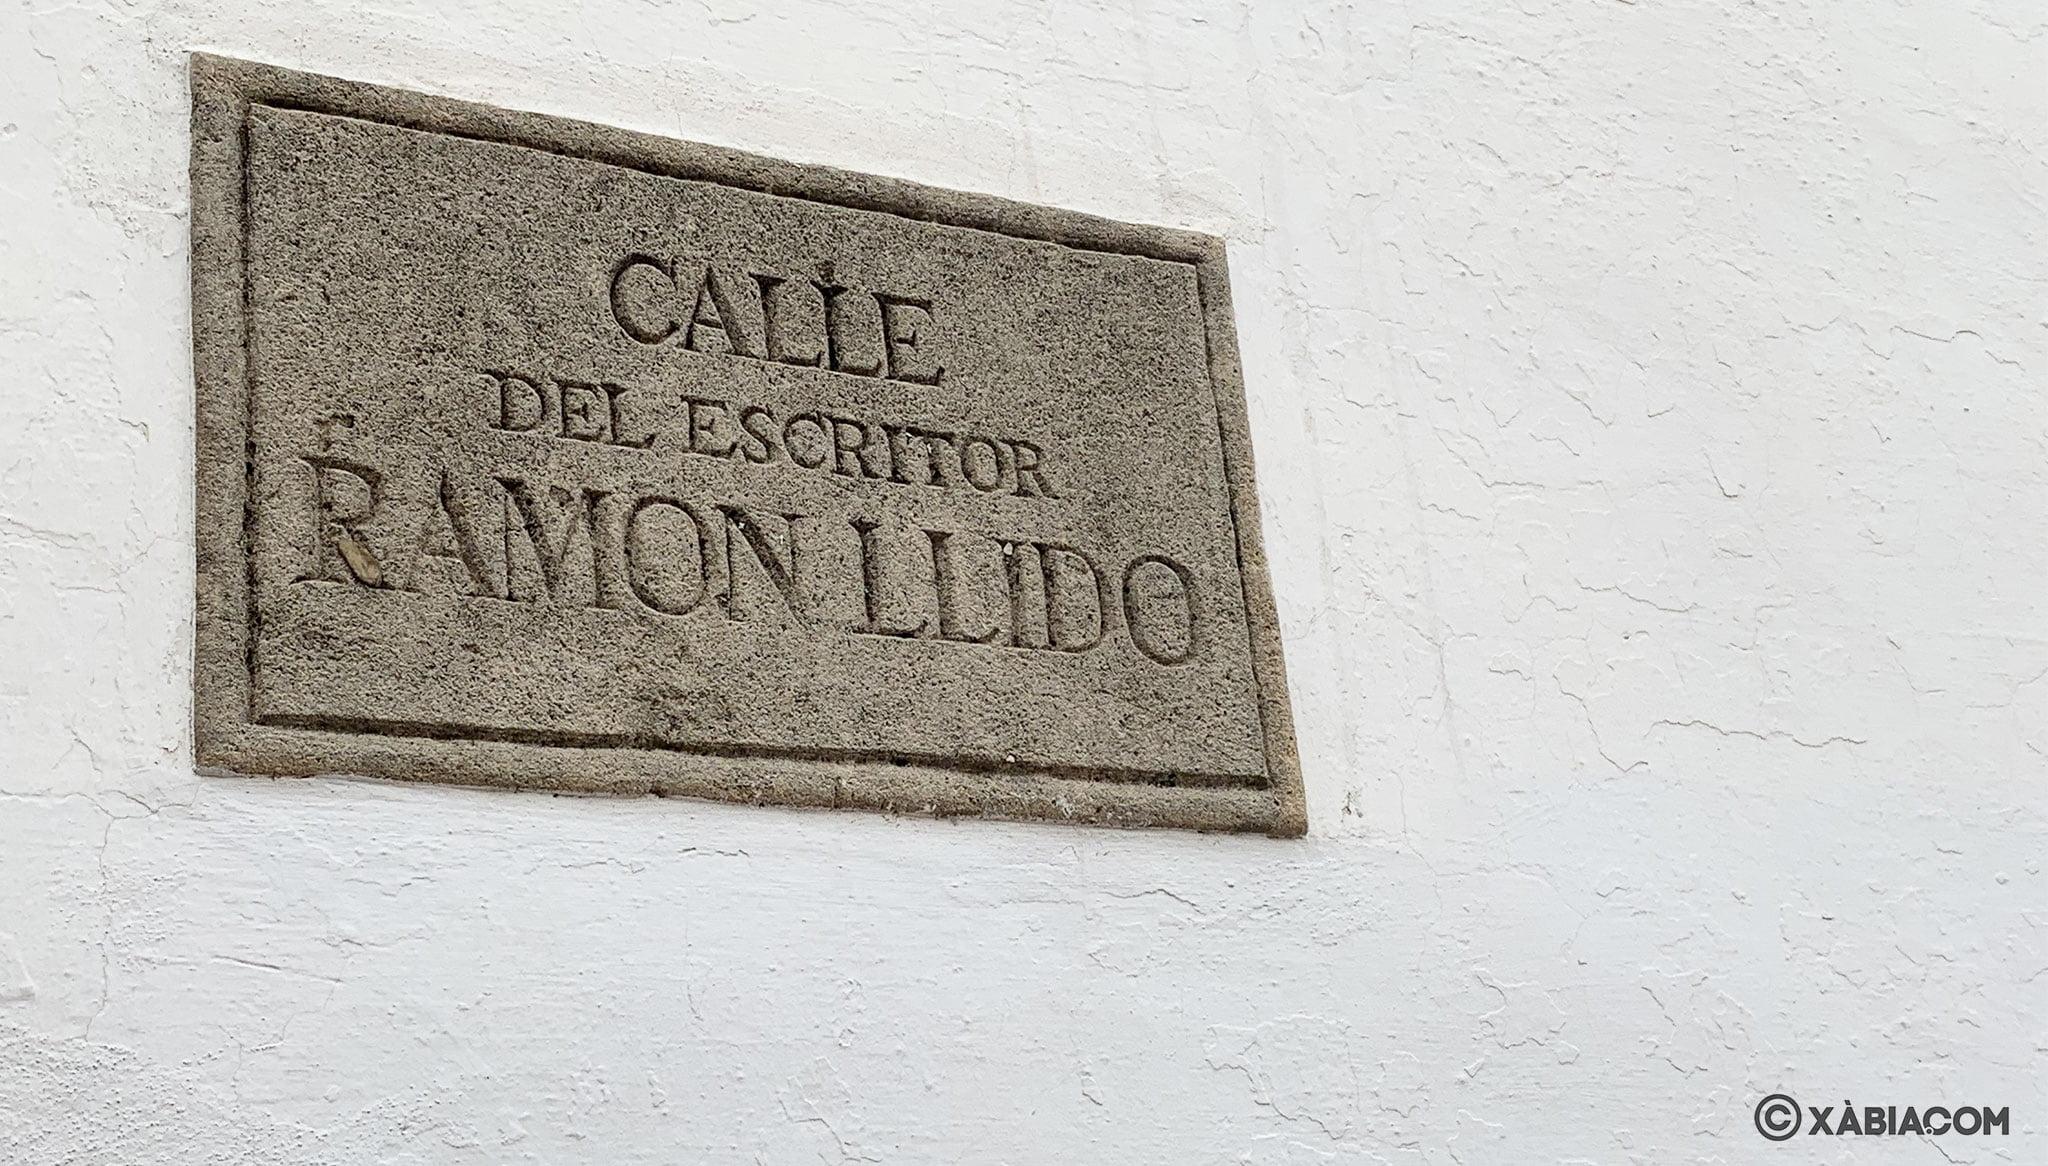 Placa de la calle Ramón Llidó en Xàbia